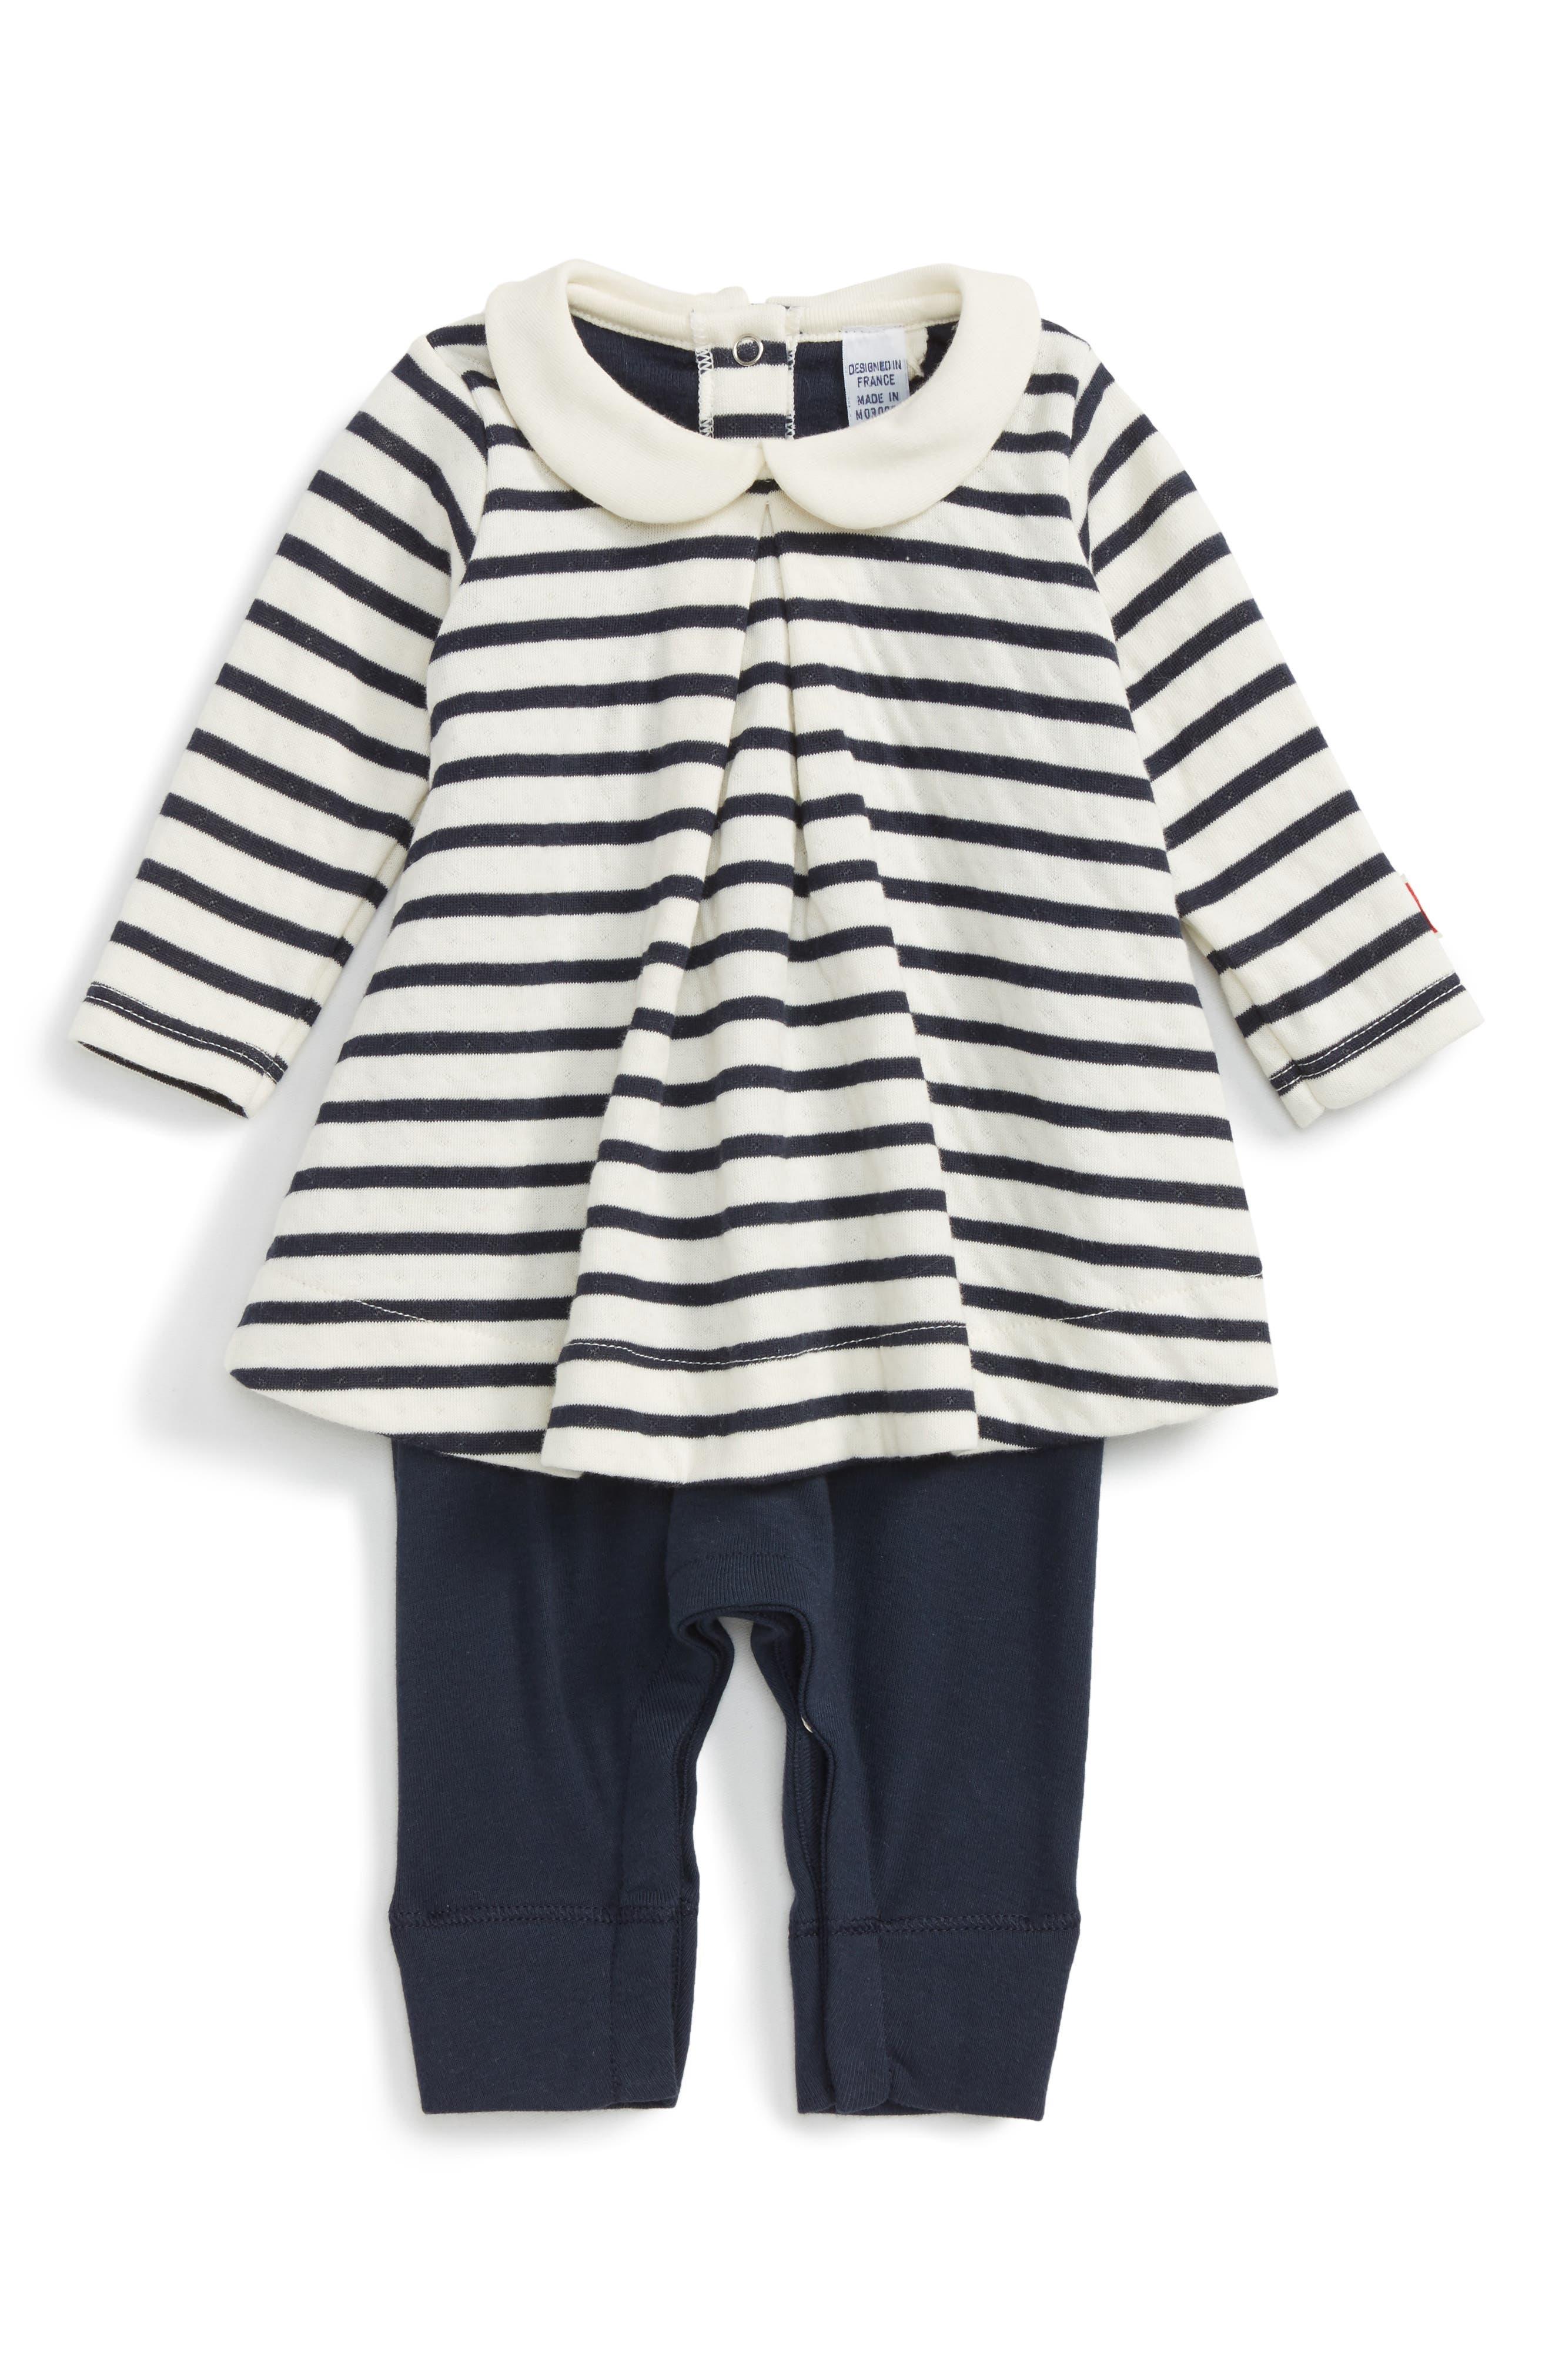 Main Image - Petit Bateau Stripe Romper (Baby Girls)